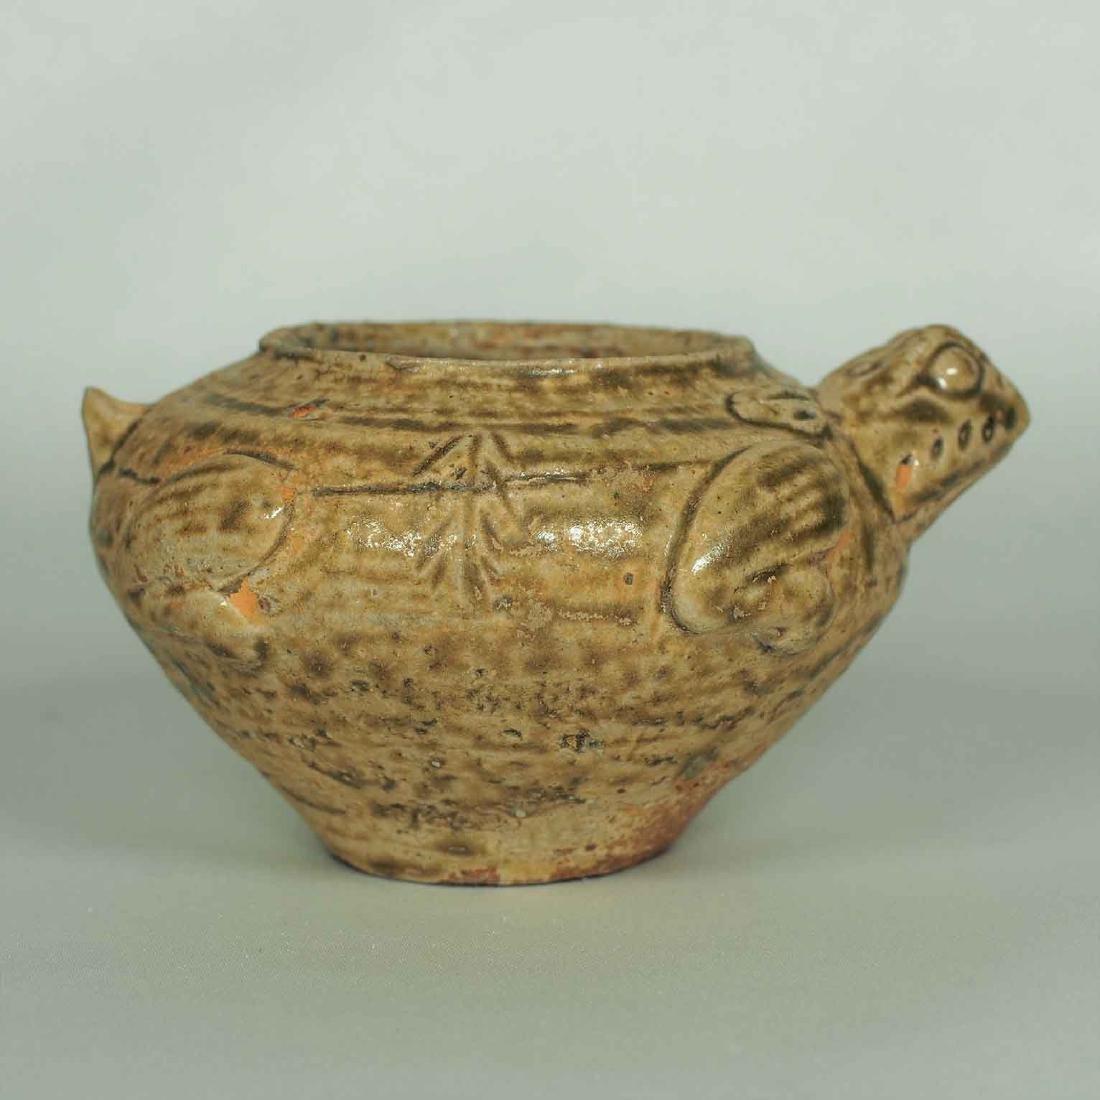 Proto-Porcelain Turtle-Form Water Pot, Han Dynasty - 2